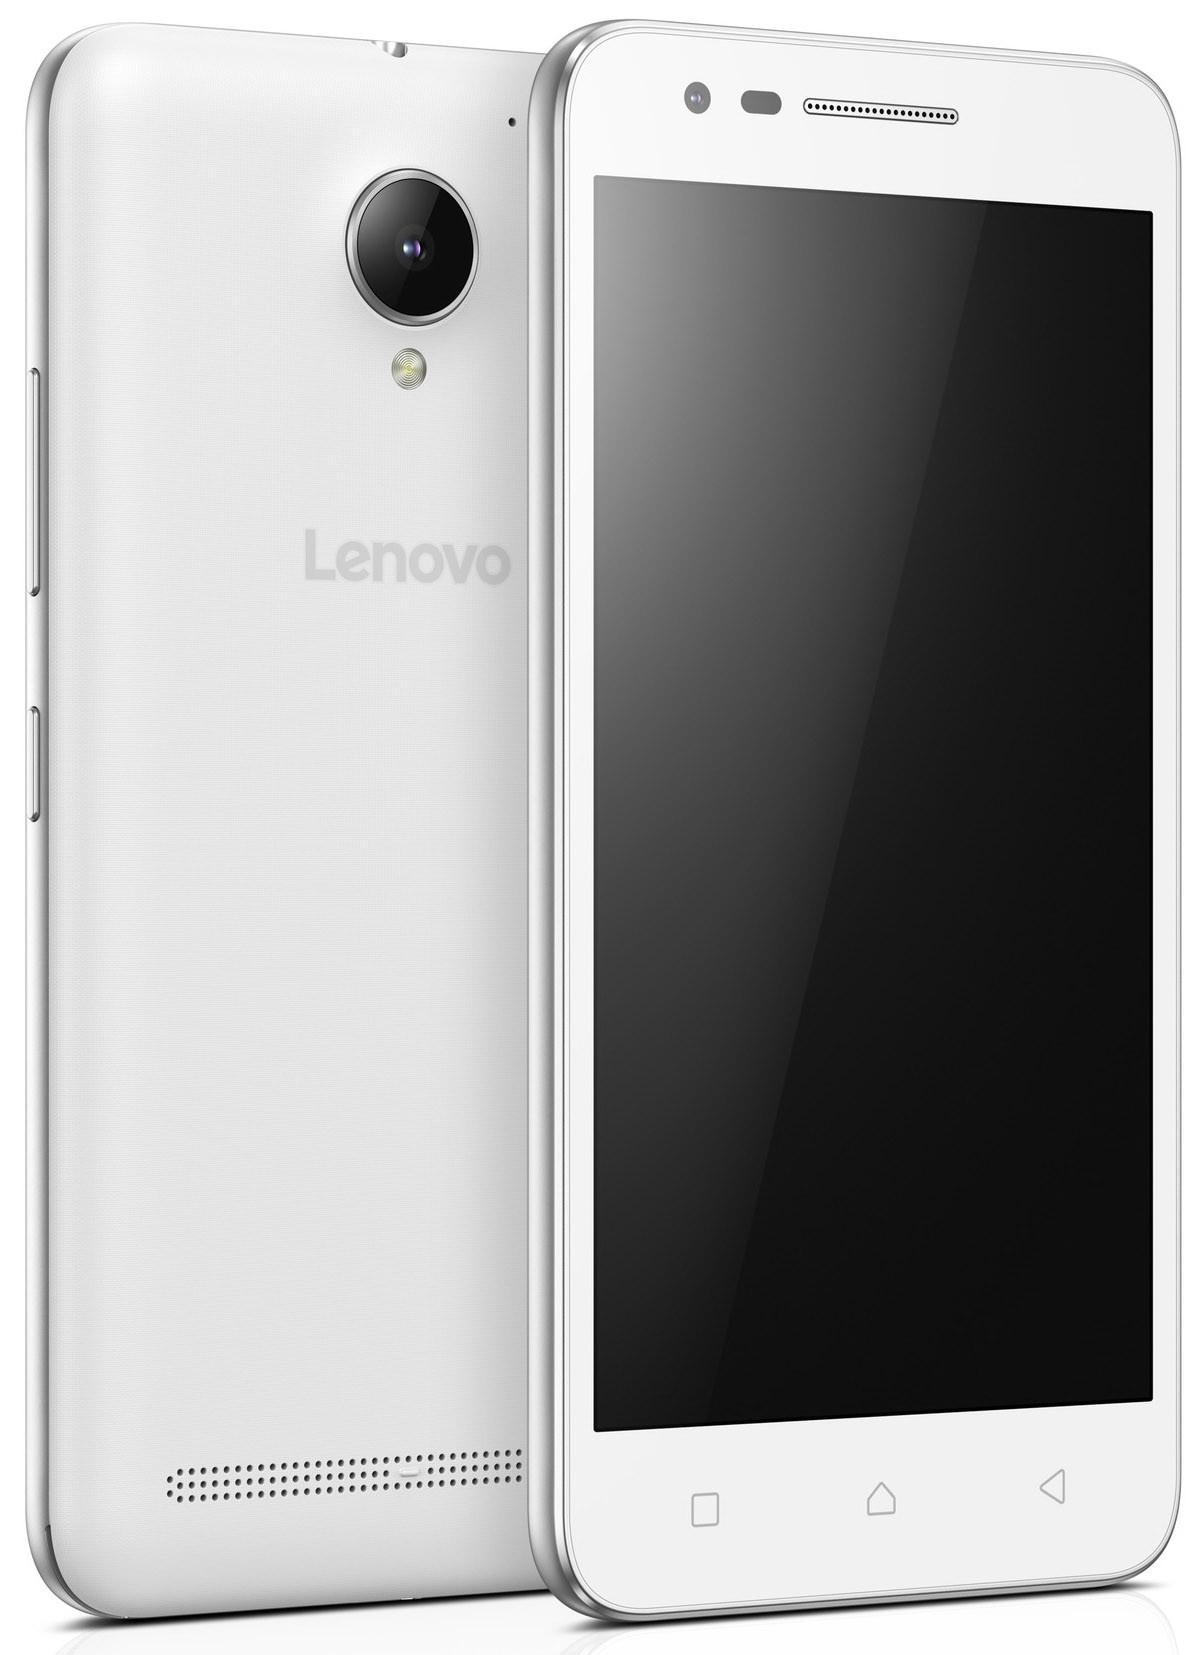 Смартфон Lenovo C2 k10a40 8Gb White - Фото 1